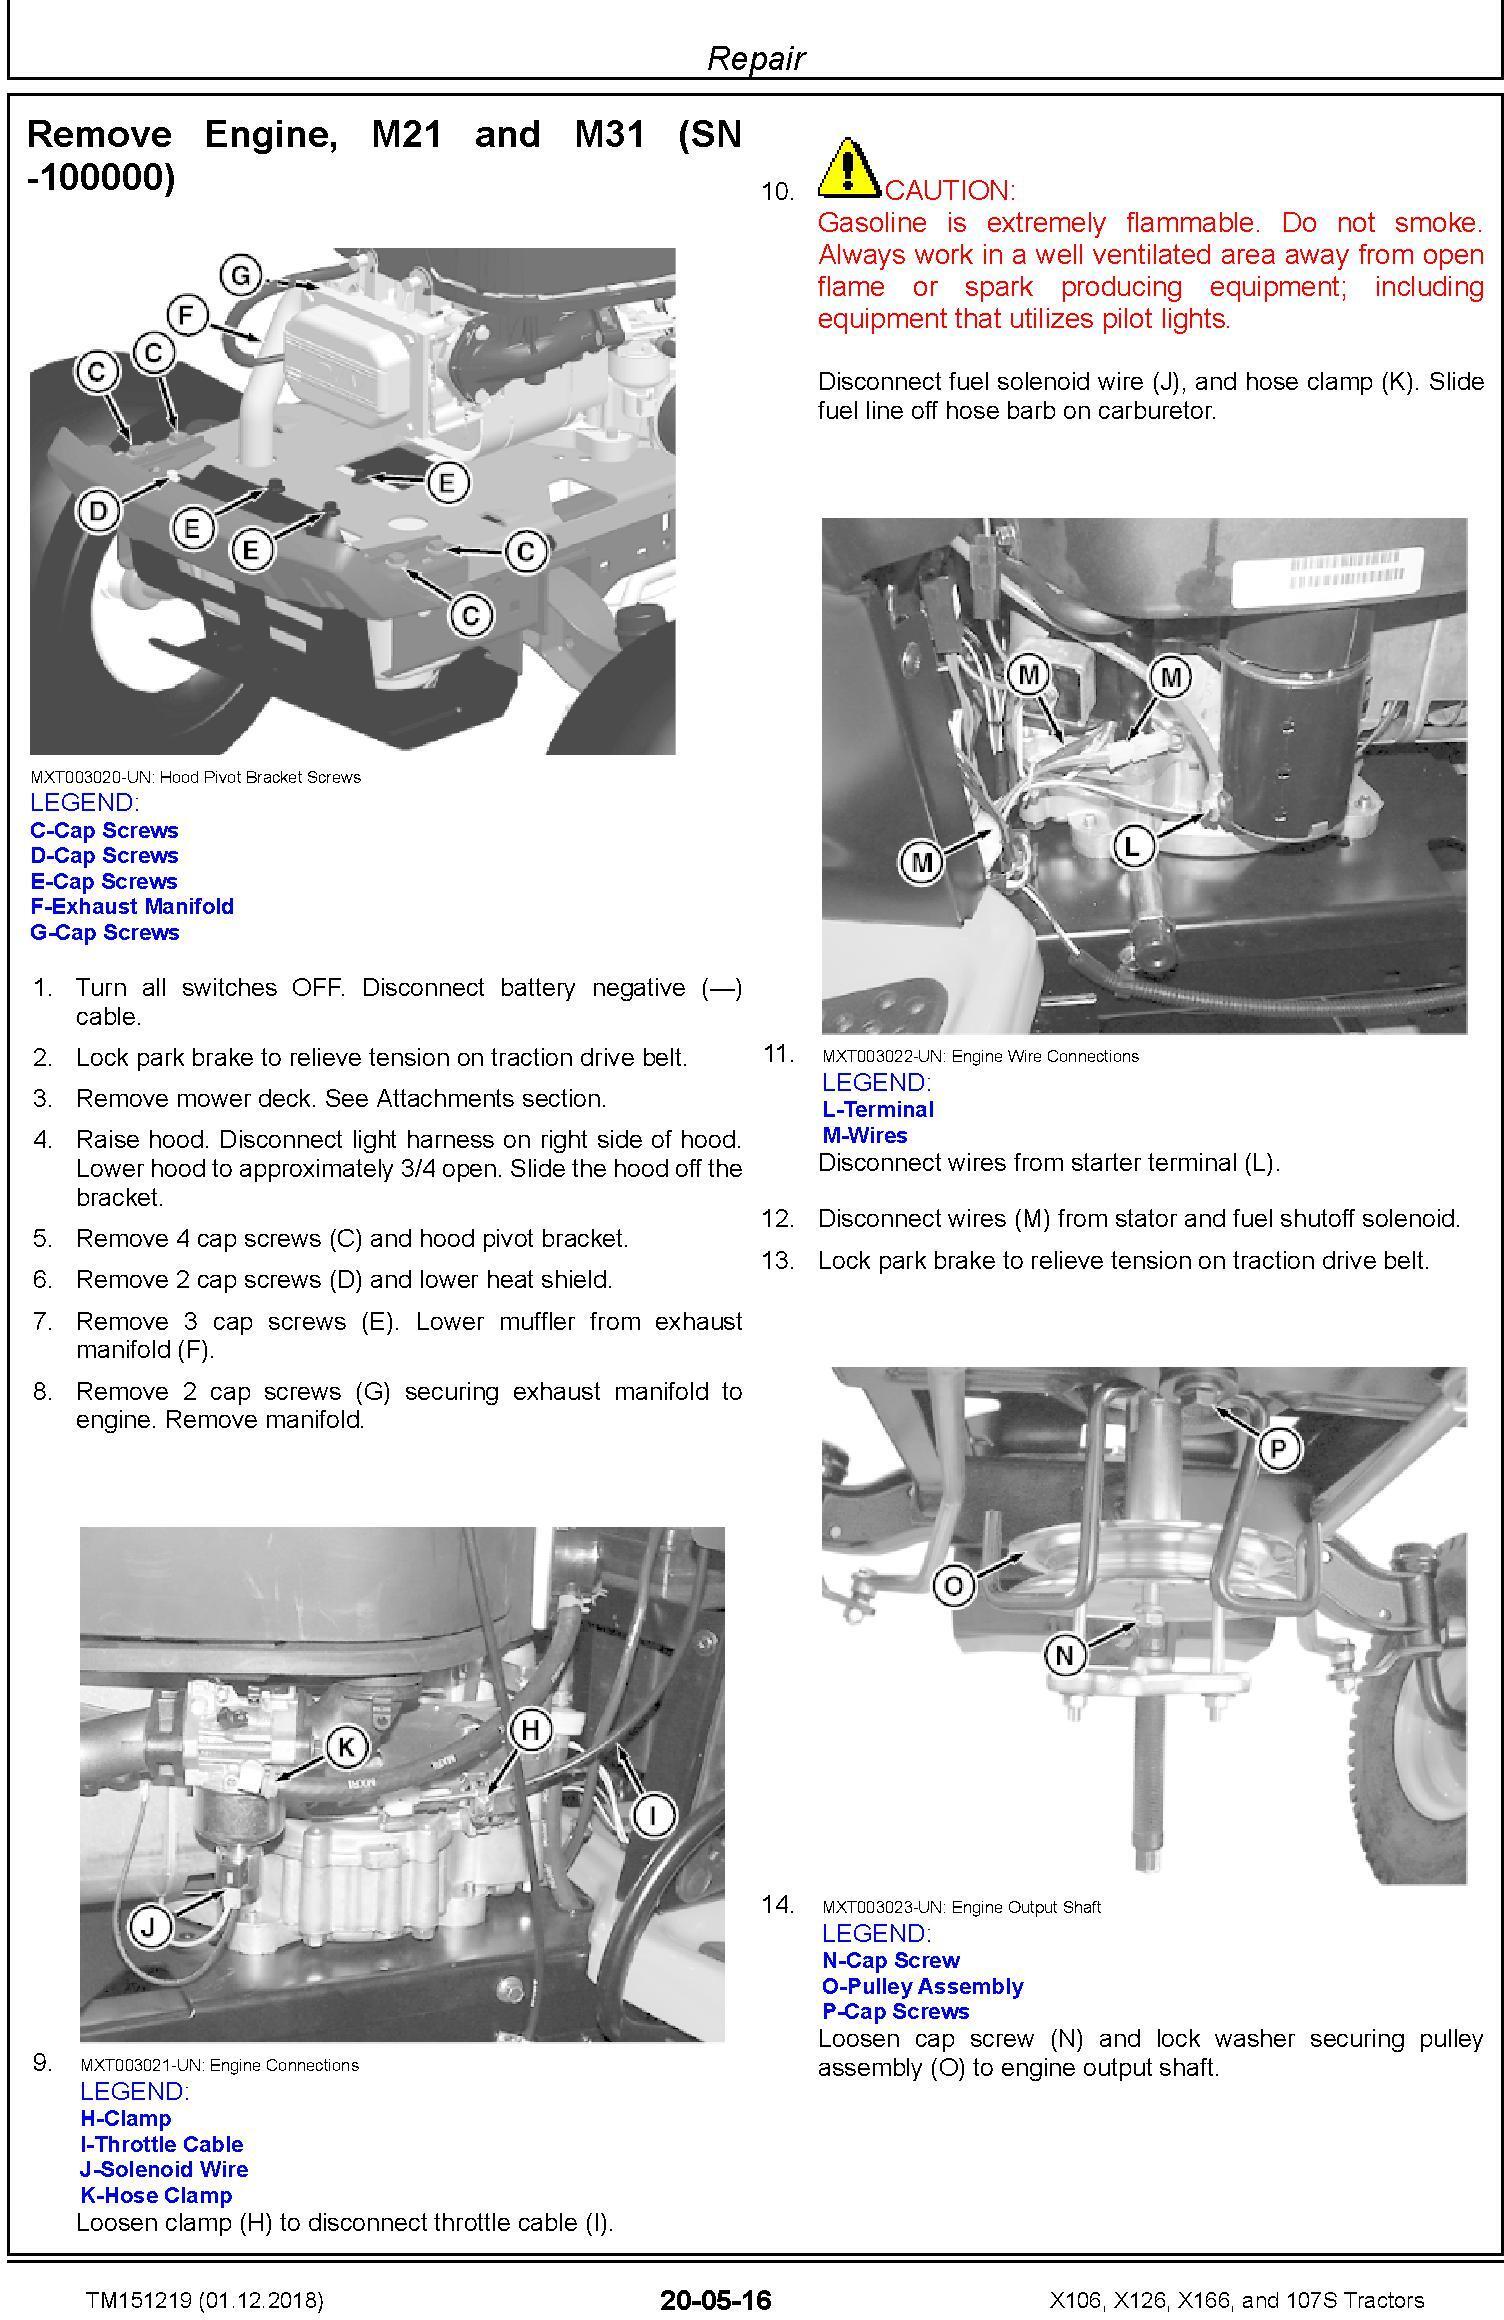 John Deere X106, X126, X166, and 107S Tractors (SN. 010001-) Technical Service Manual (TM151219) - 1